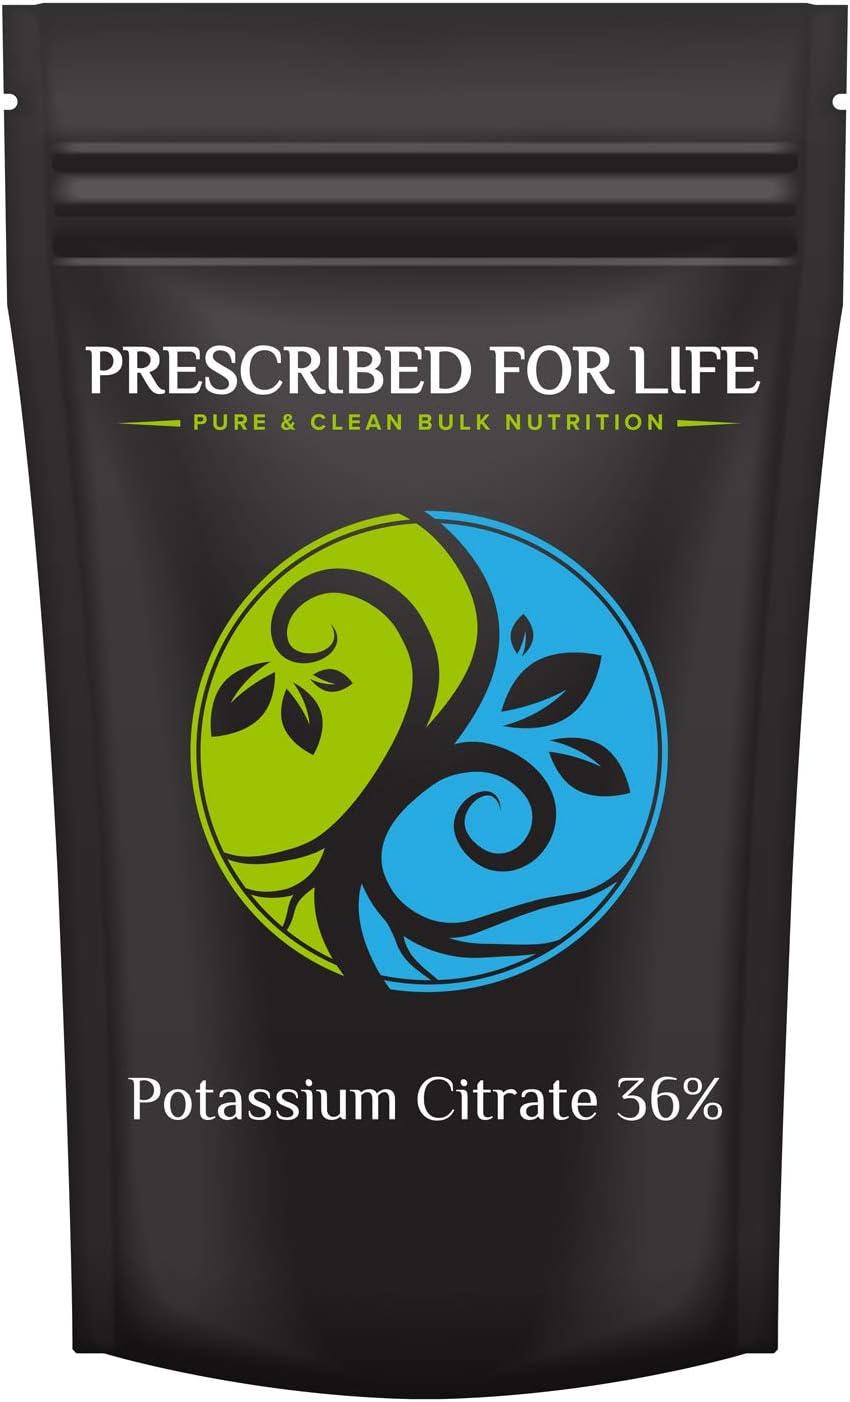 Prescribed for Life Potassium Citrate - TriPotassium Citrate Monohydrate - USP Food Grade Fine Granular - 36% K, 12 oz (340 g)